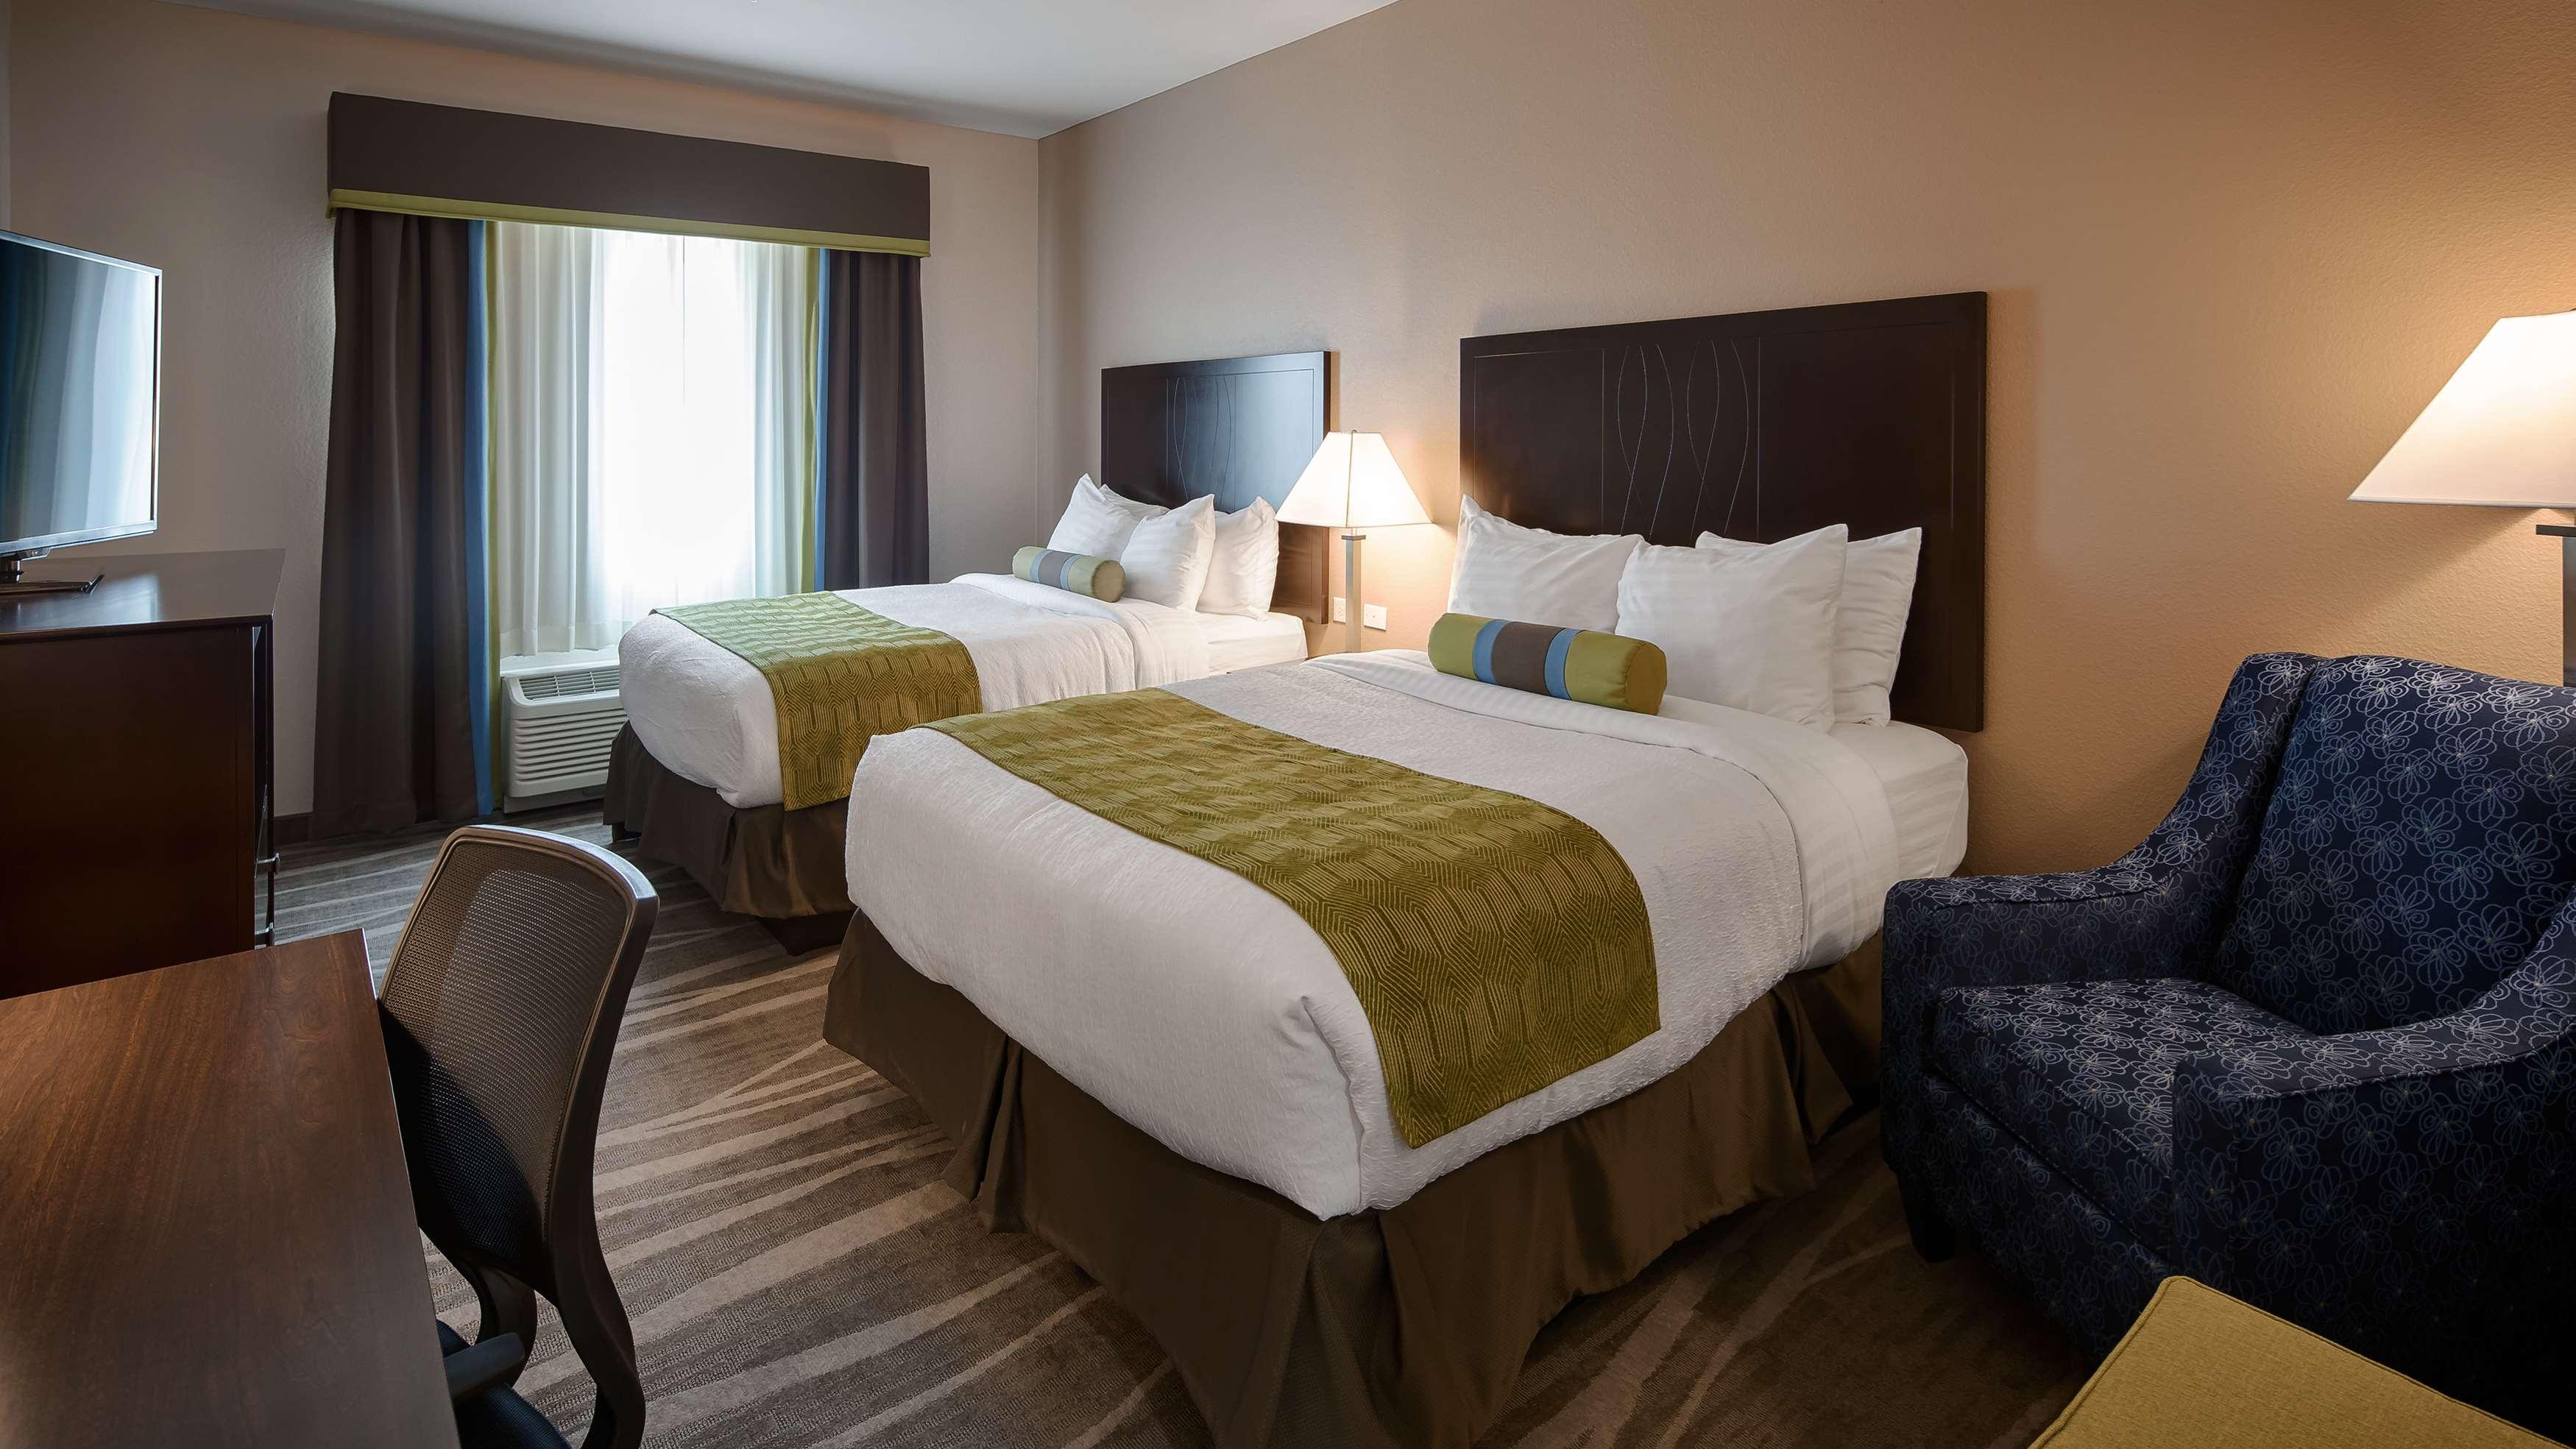 Best Western Plus Denver City Hotel & Suites image 15